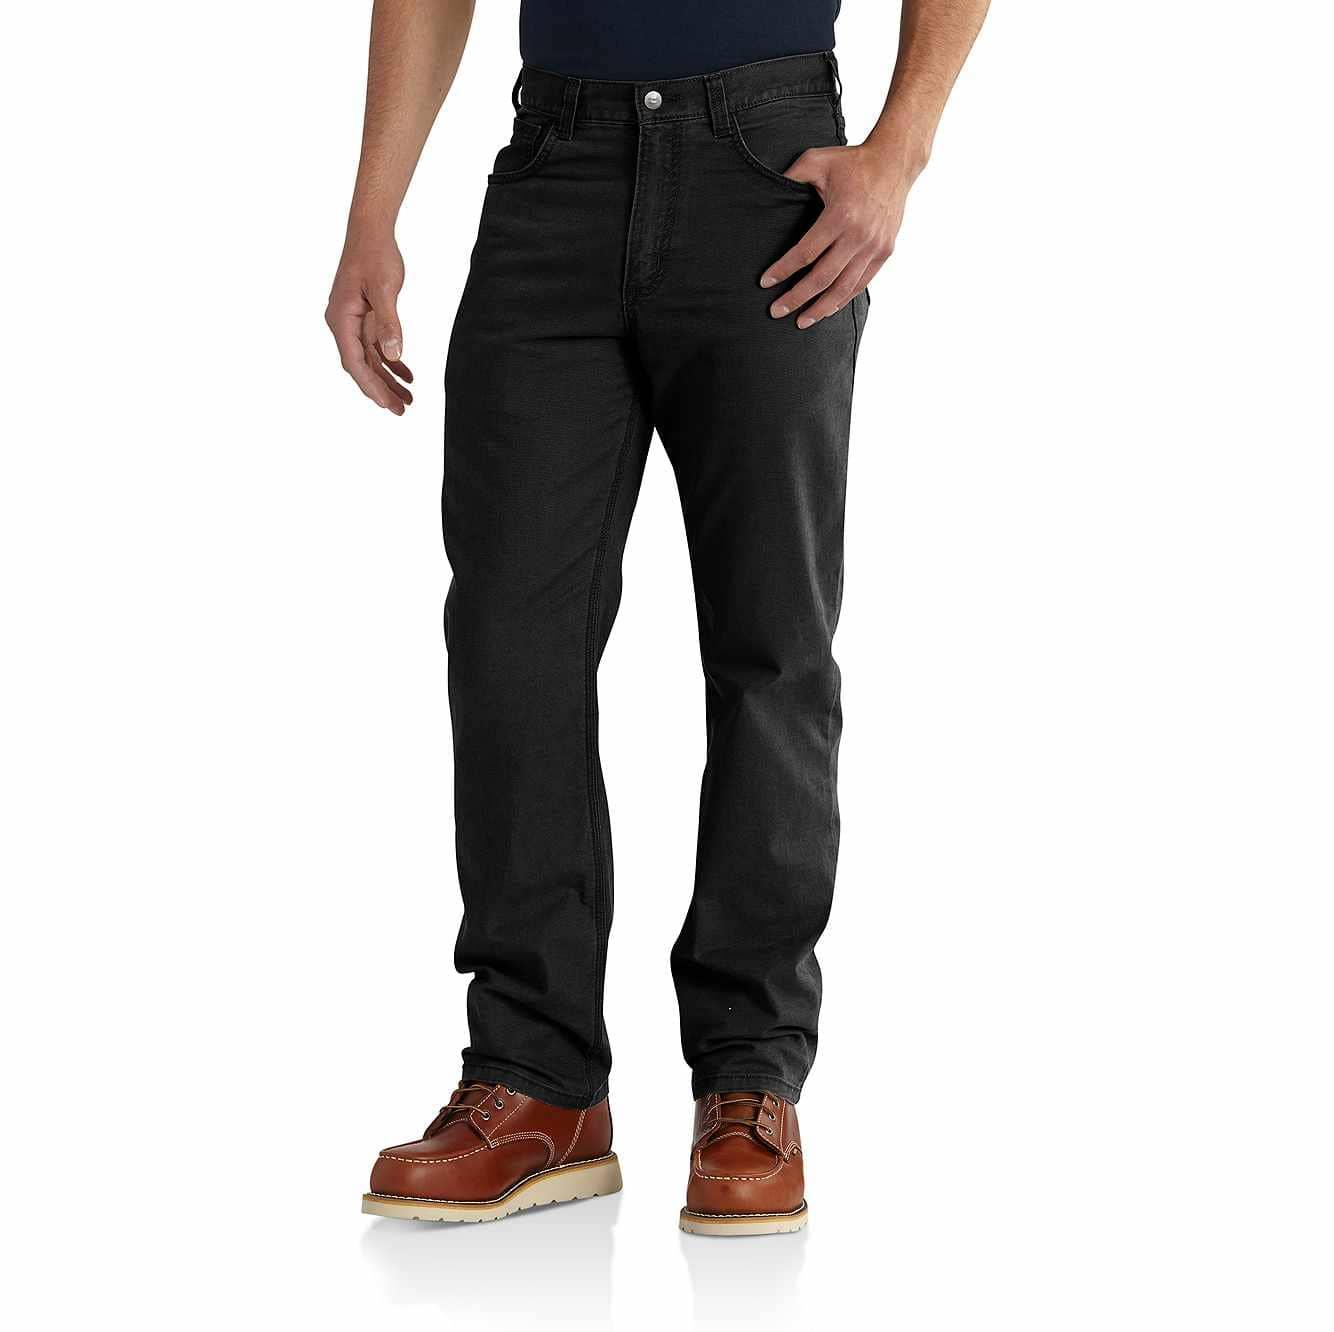 031467cd3 Men's Rugged Flex® Rigby 5-Pocket Work Pant 102517 | Carhartt